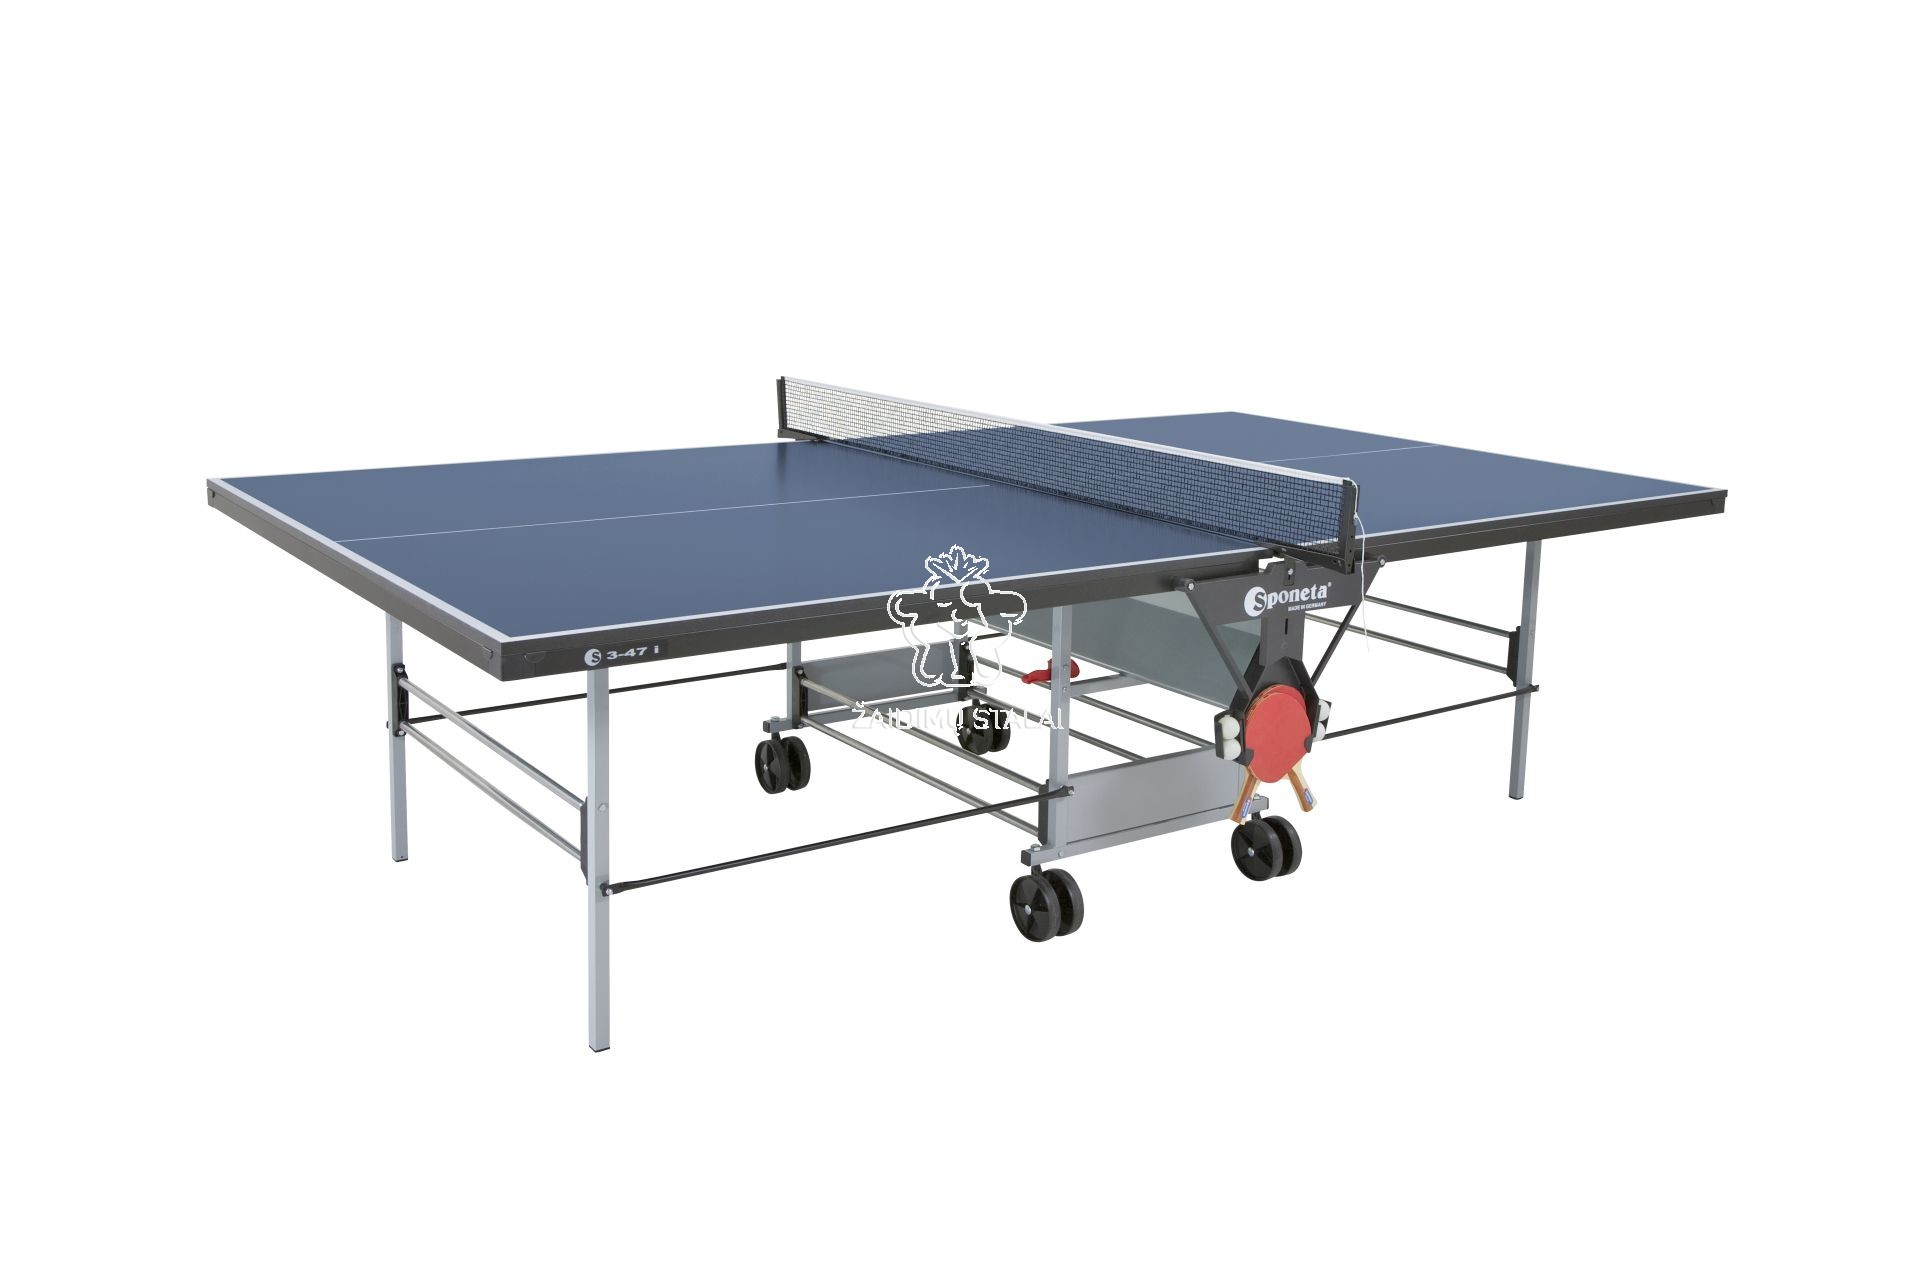 Stalo teniso stalas Sponeta S3-47i, mėlynas, 19mm MDF vidaus